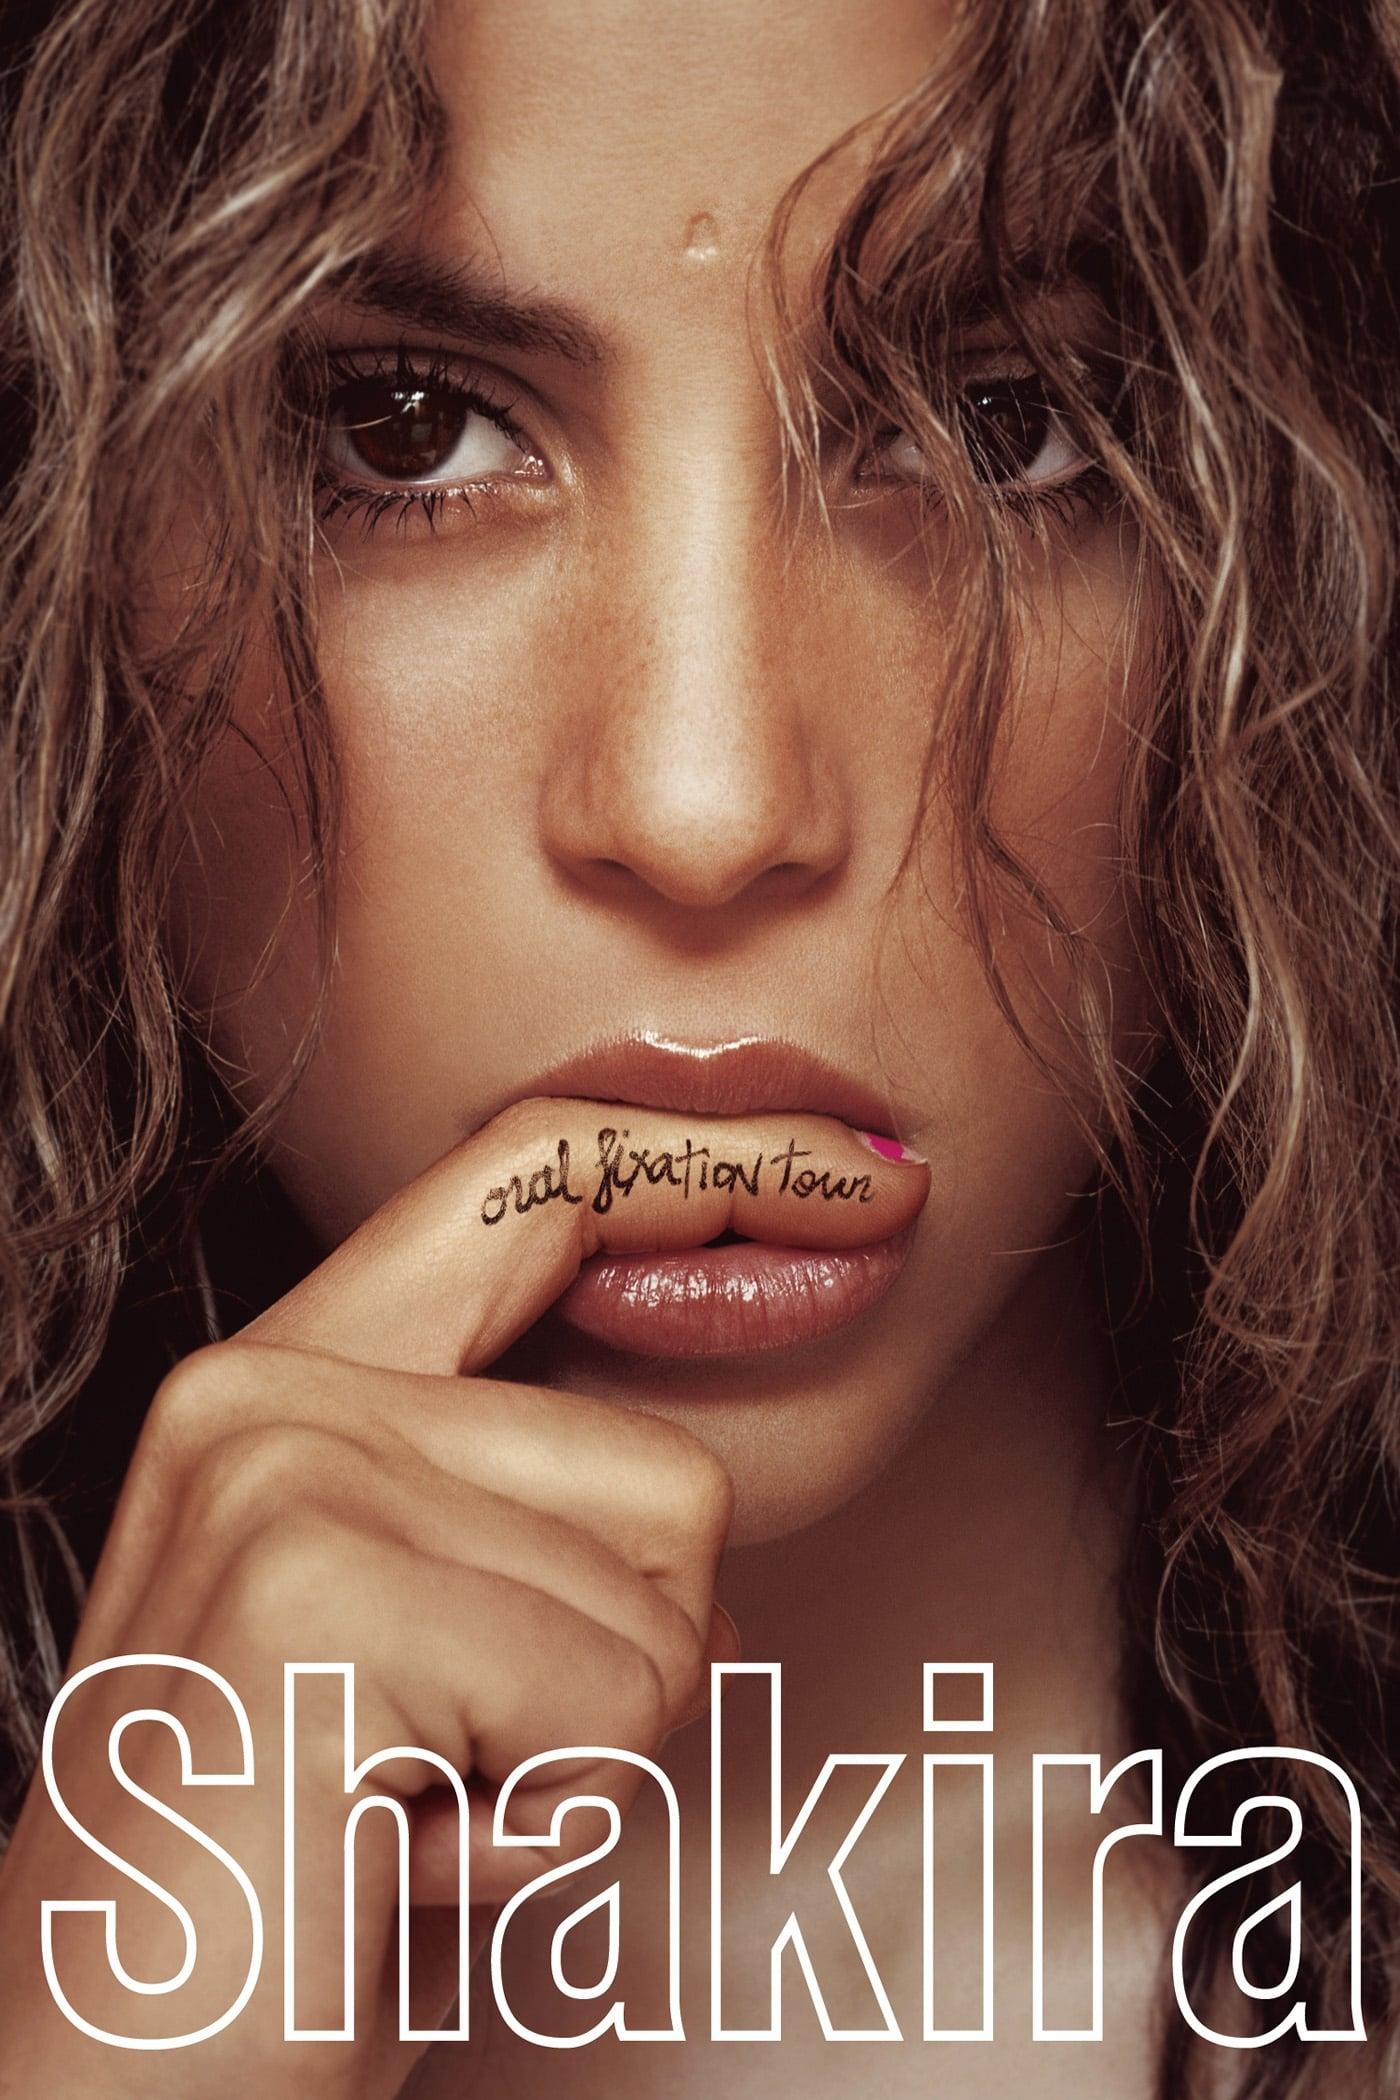 watch Shakira: Oral Fixation Tour 2006 online free